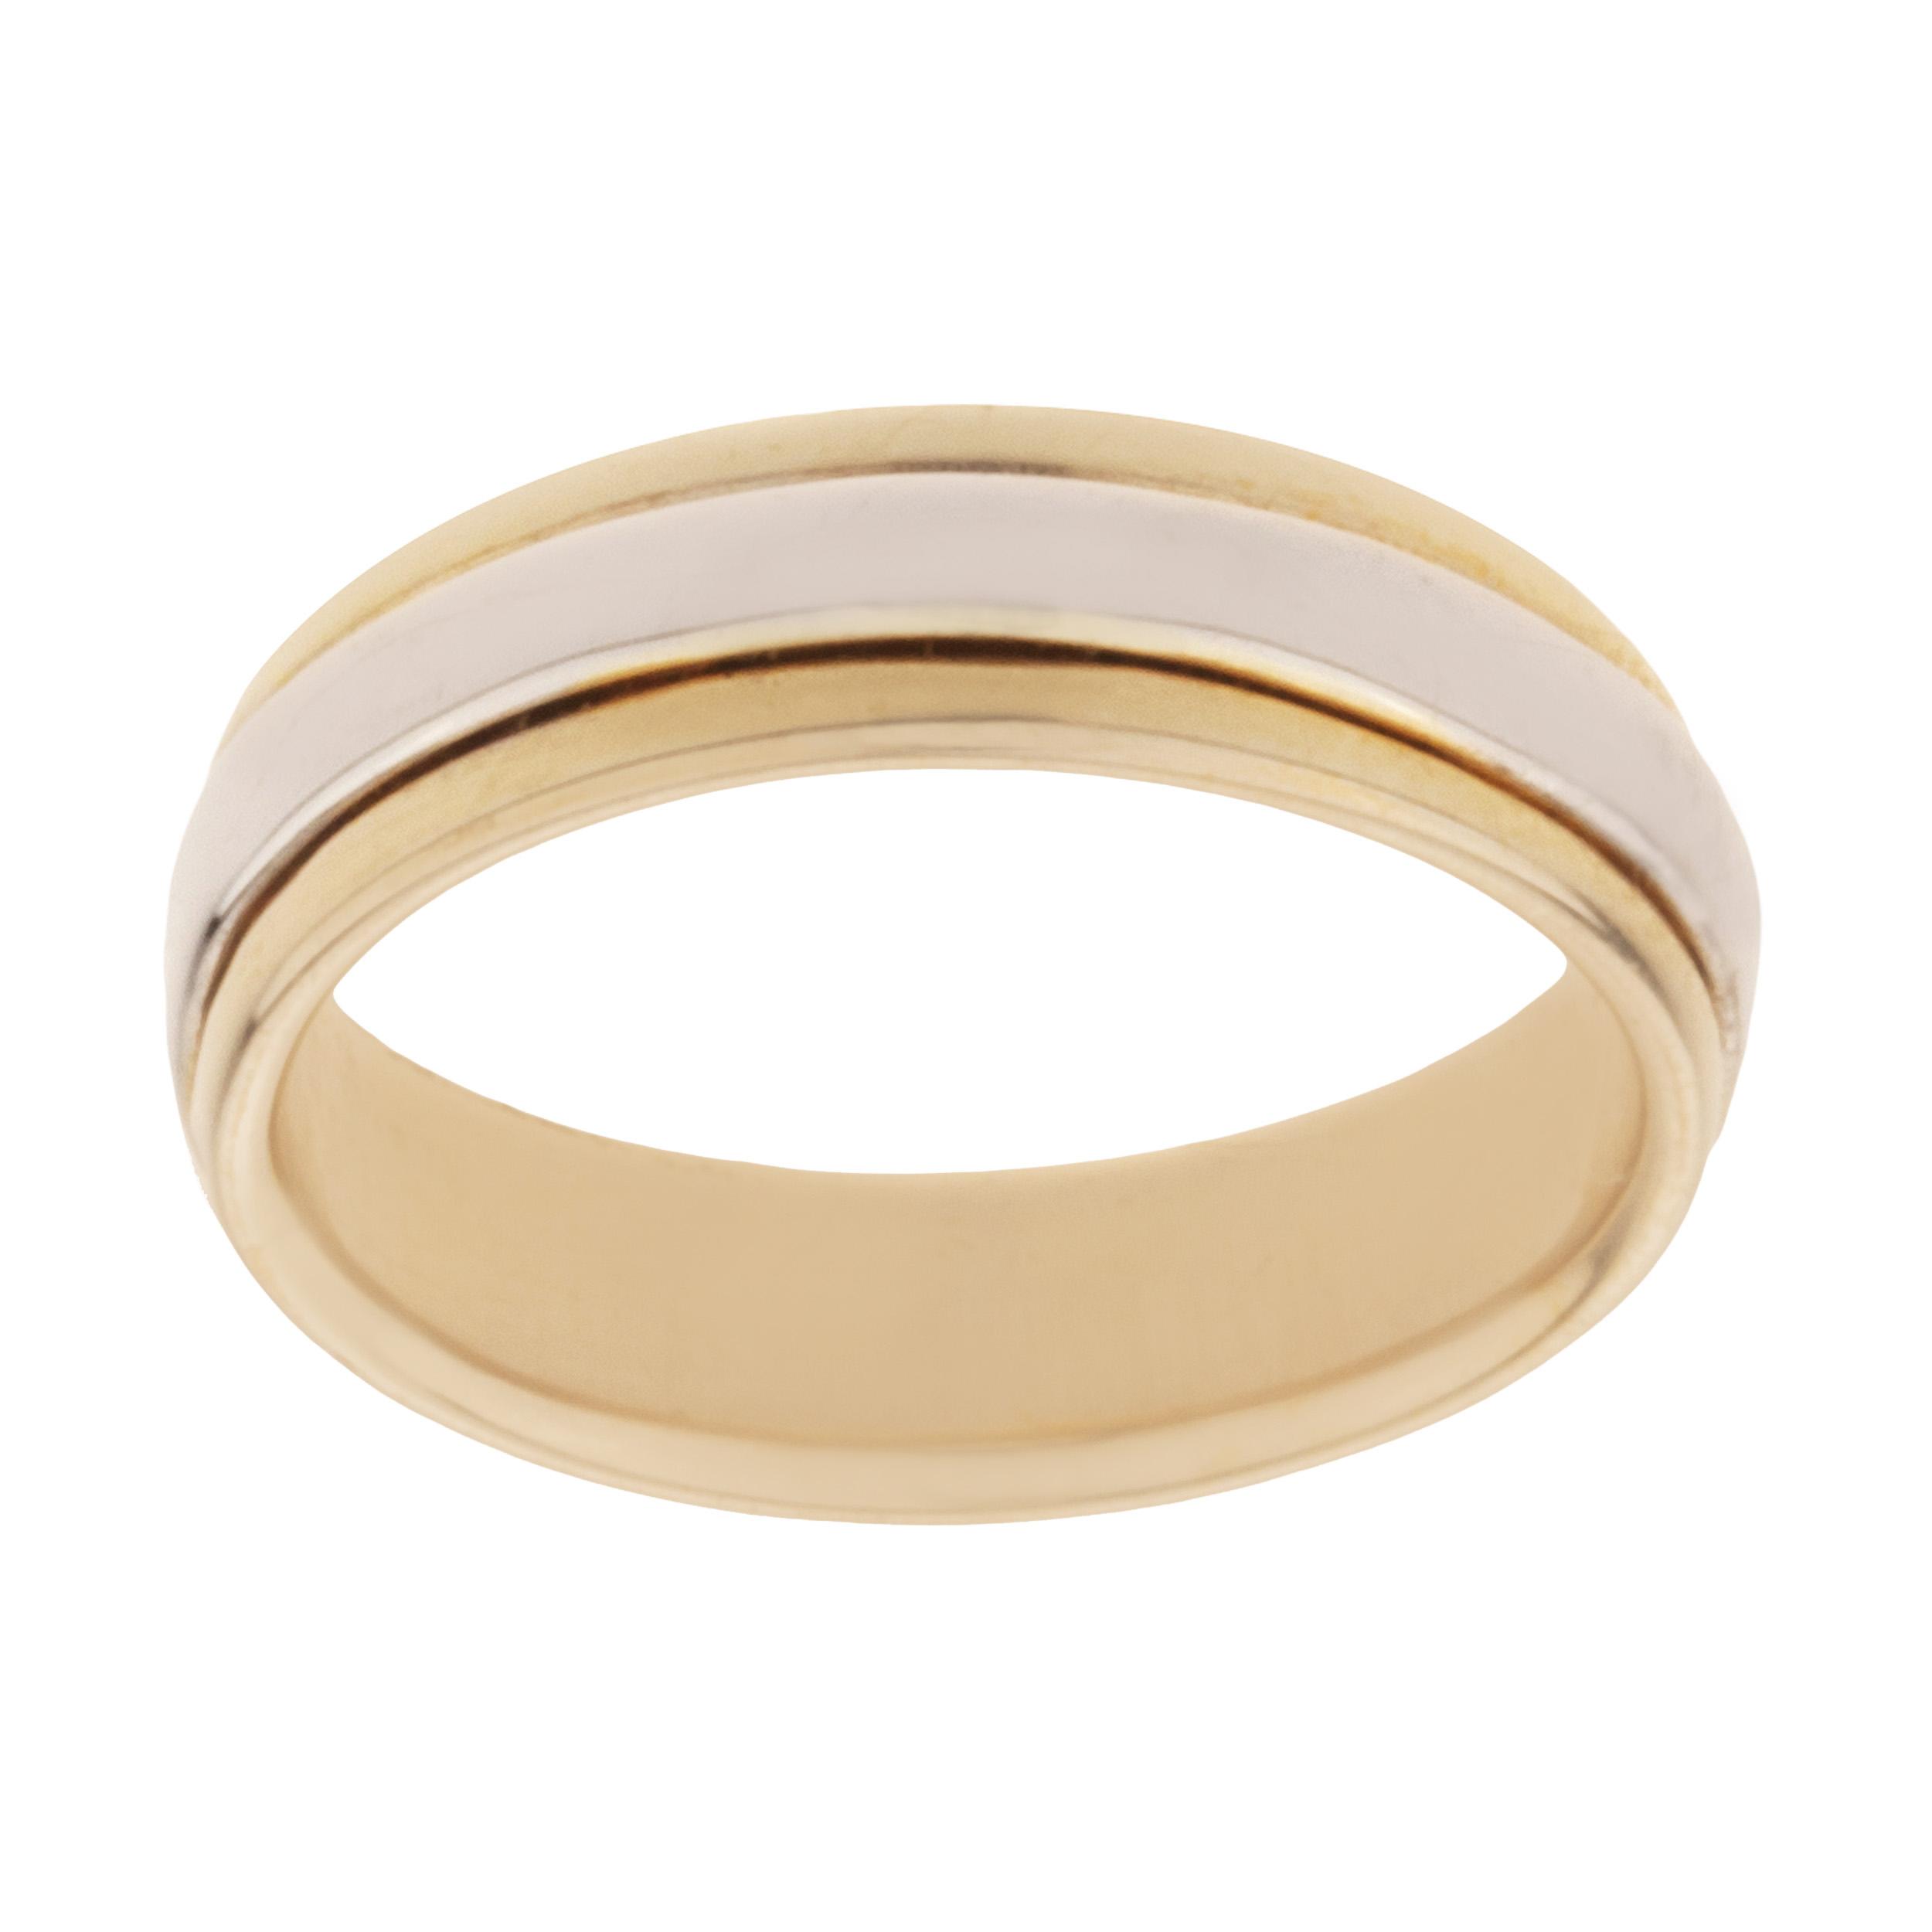 قیمت انگشتر طلا 18 عیار زنانه کد 191227